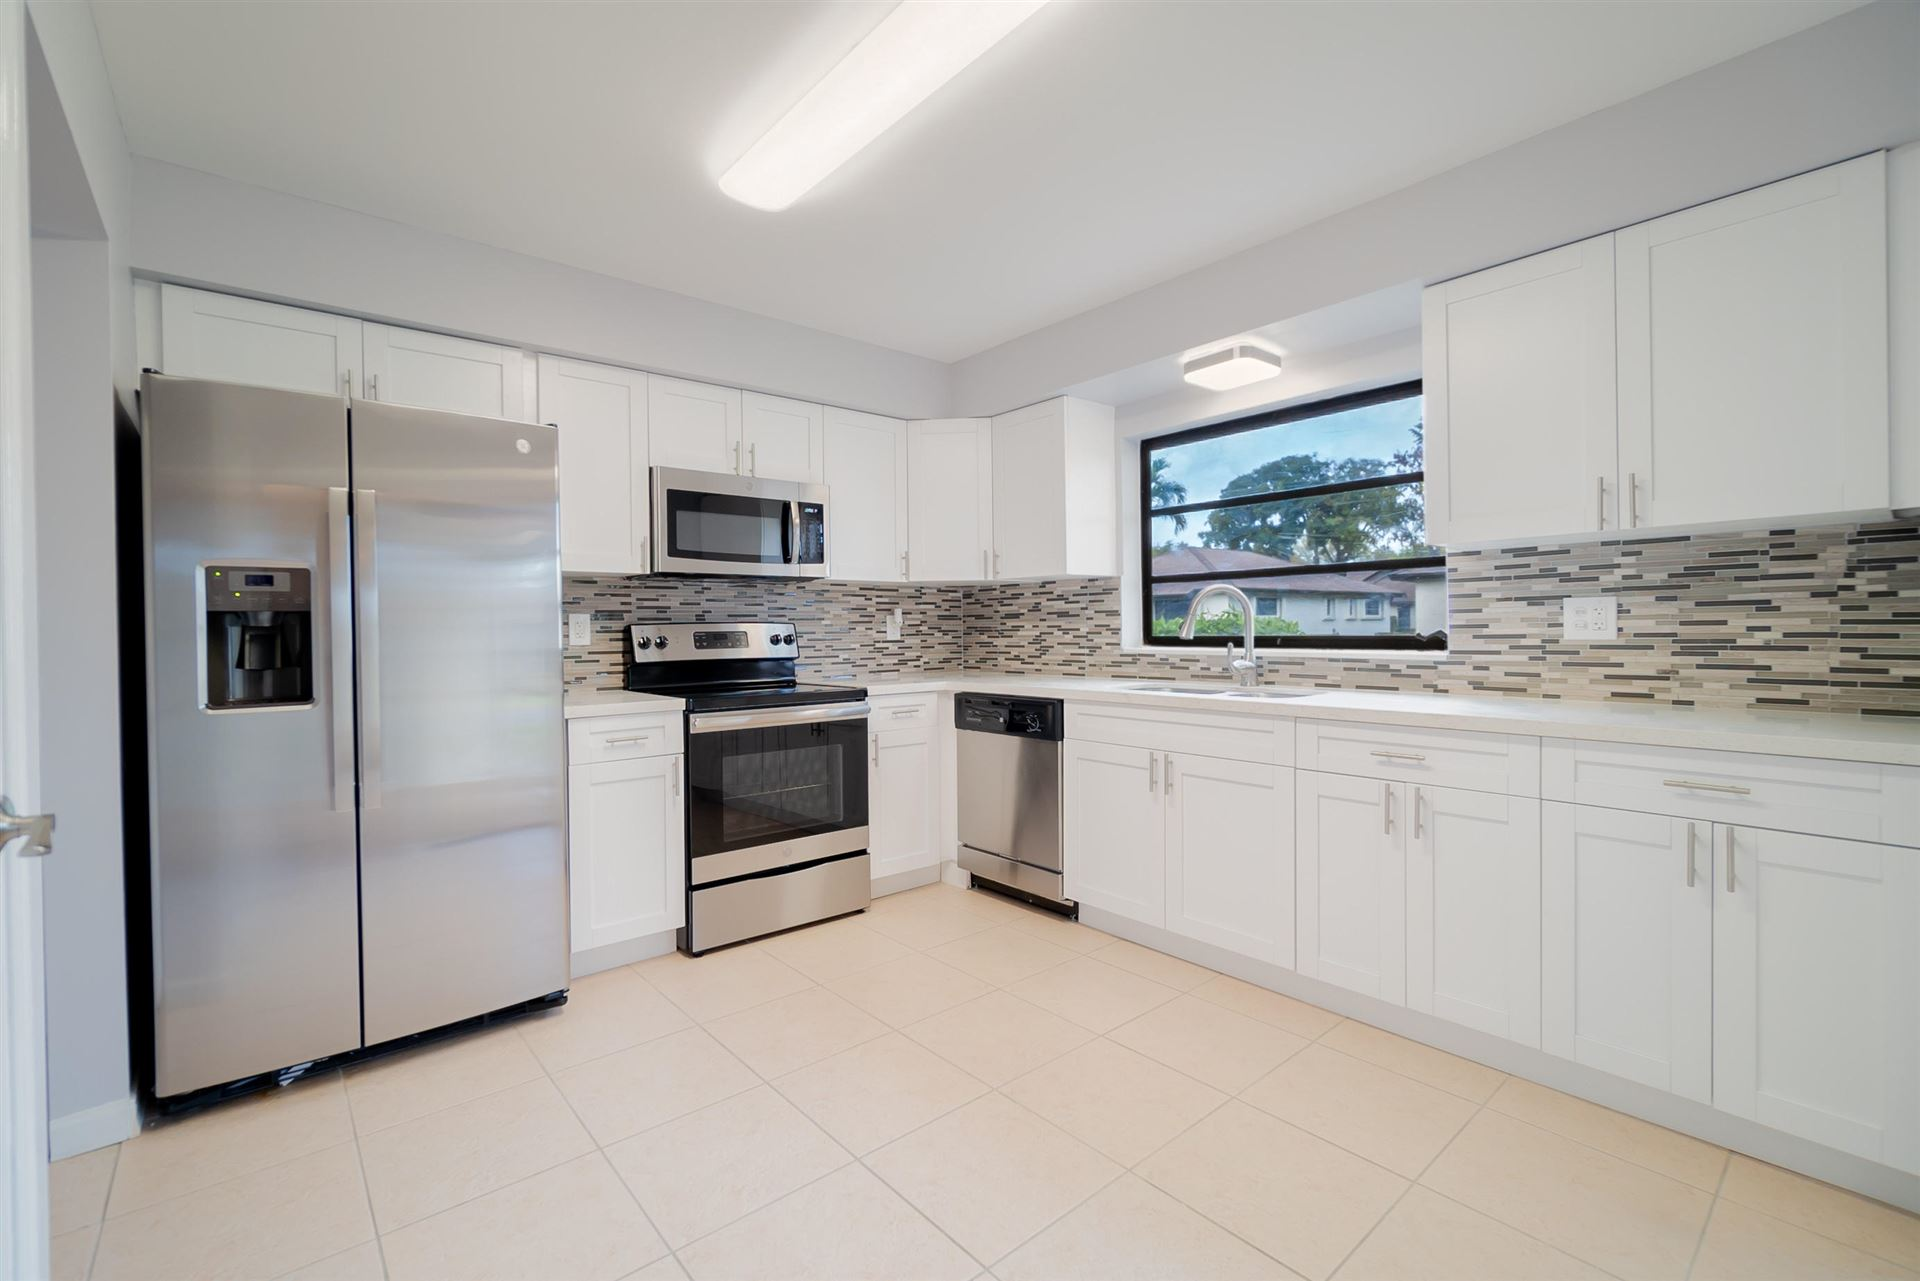 4740 Storkwood Lane #B, Boynton Beach, FL 33436 - #: RX-10602526